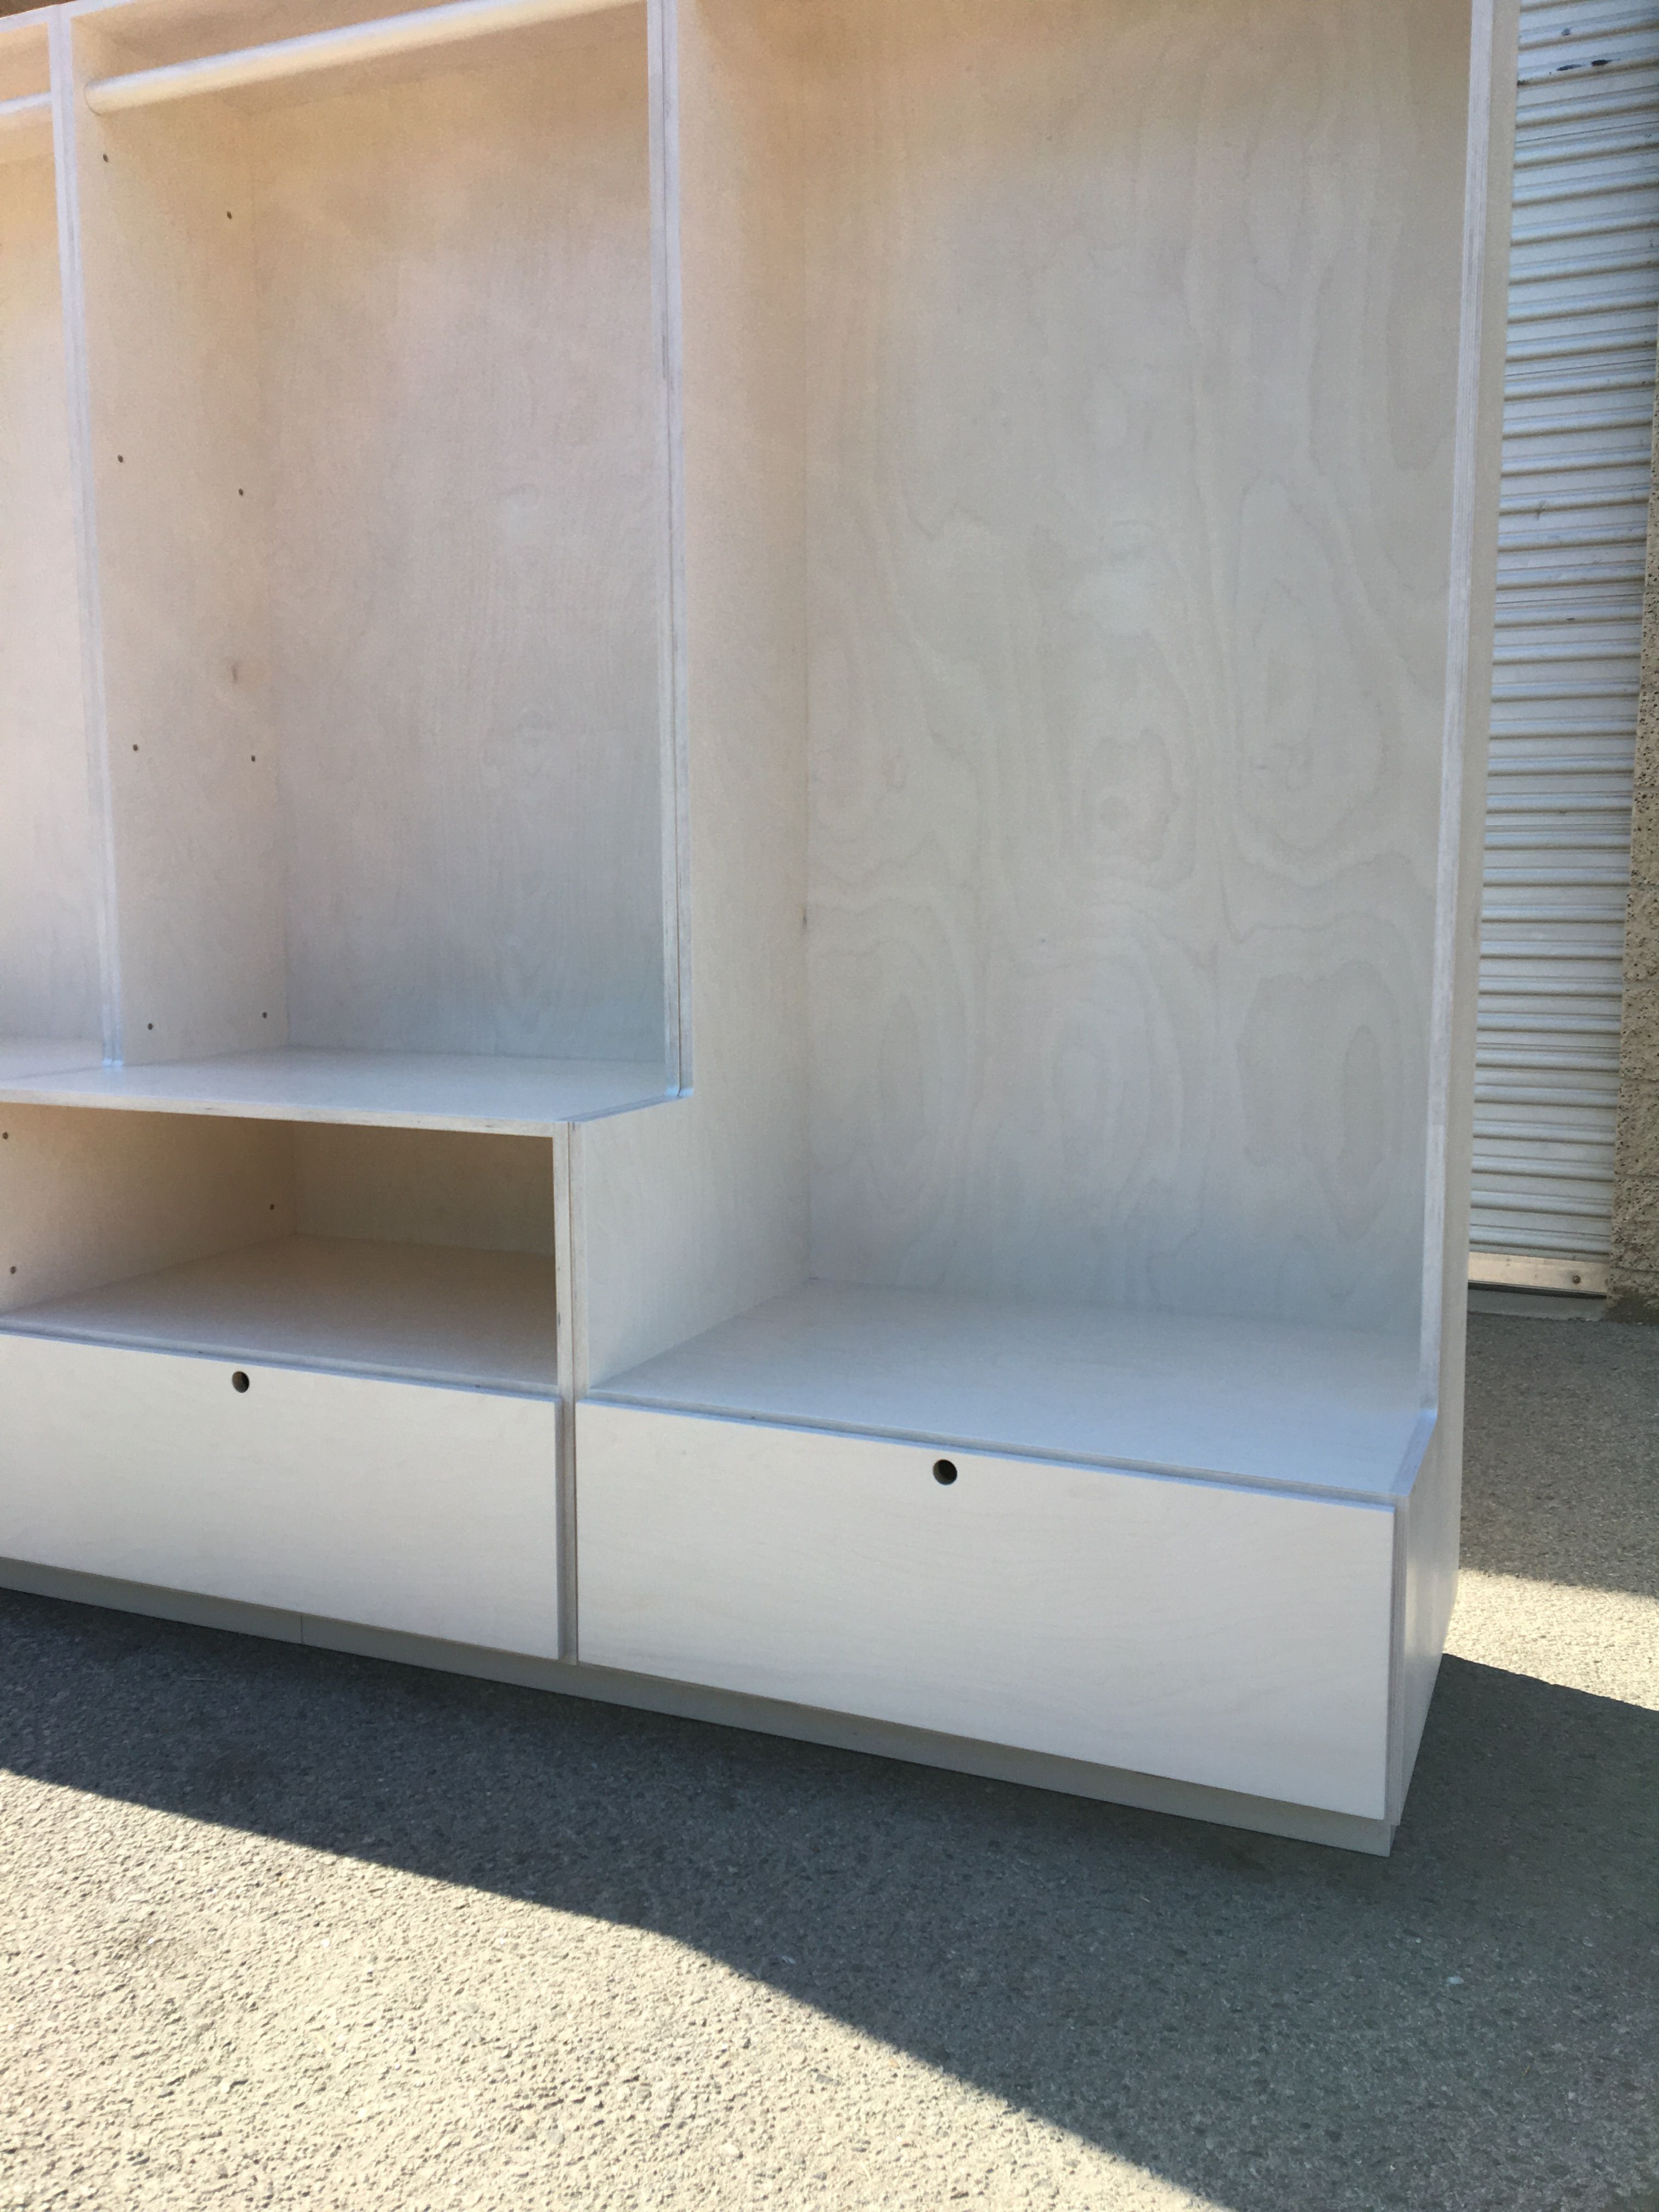 Three Section Closet product image 5